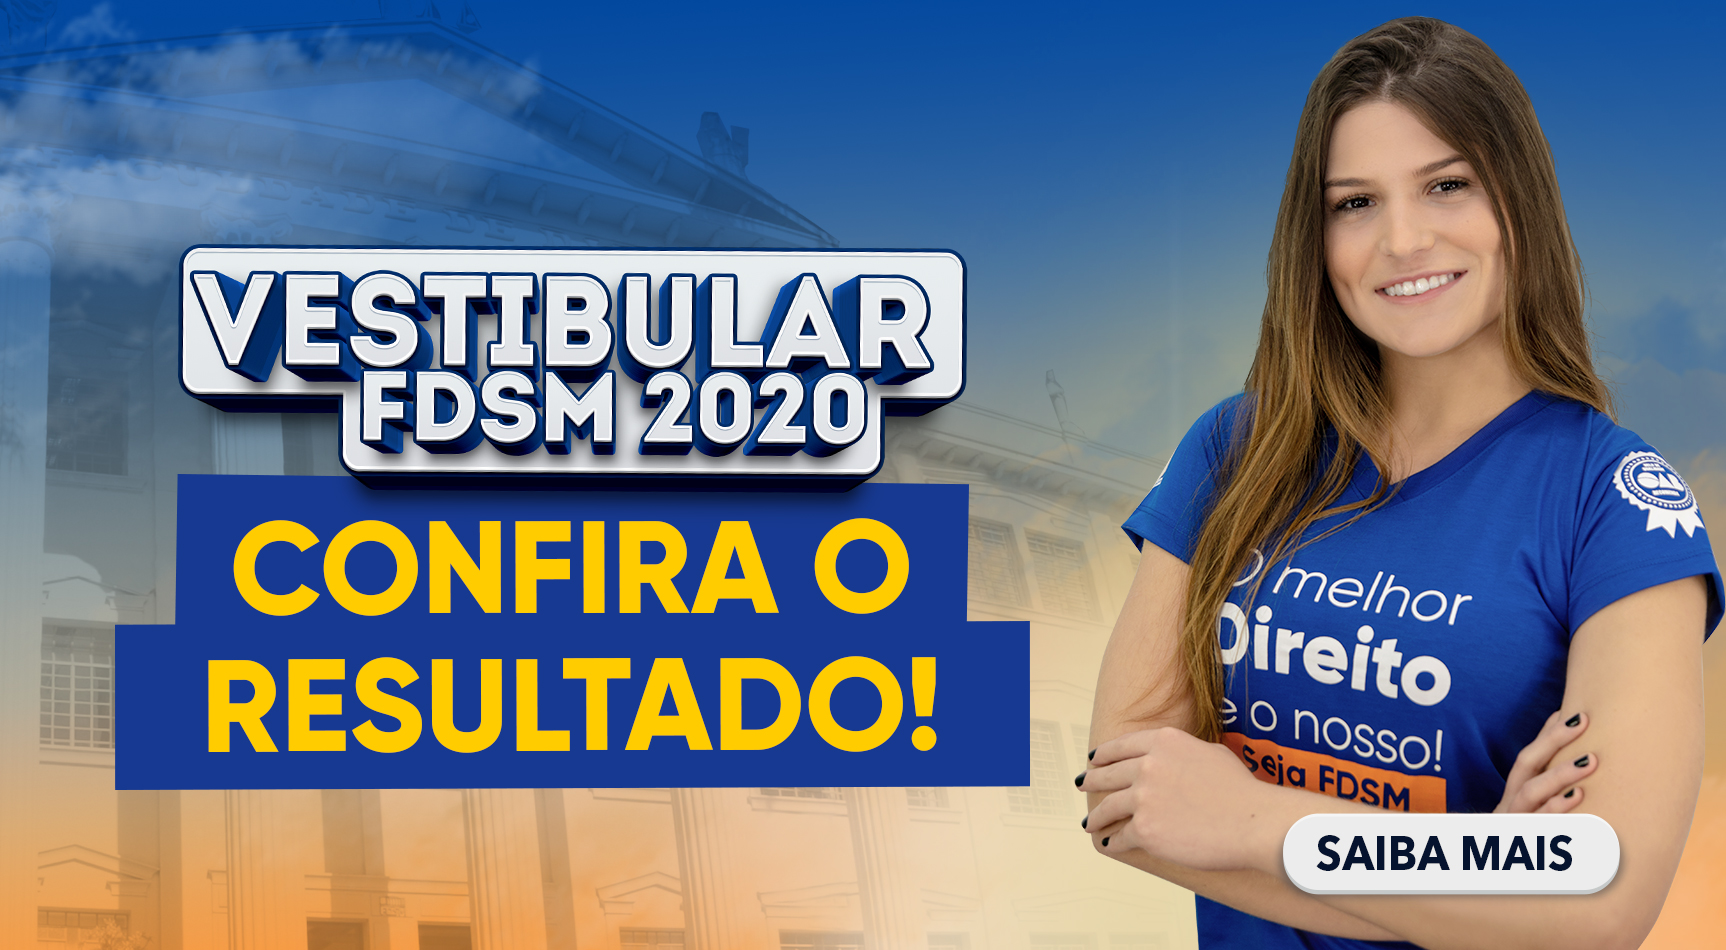 VESTIBULAR 2020 - RESULTADO